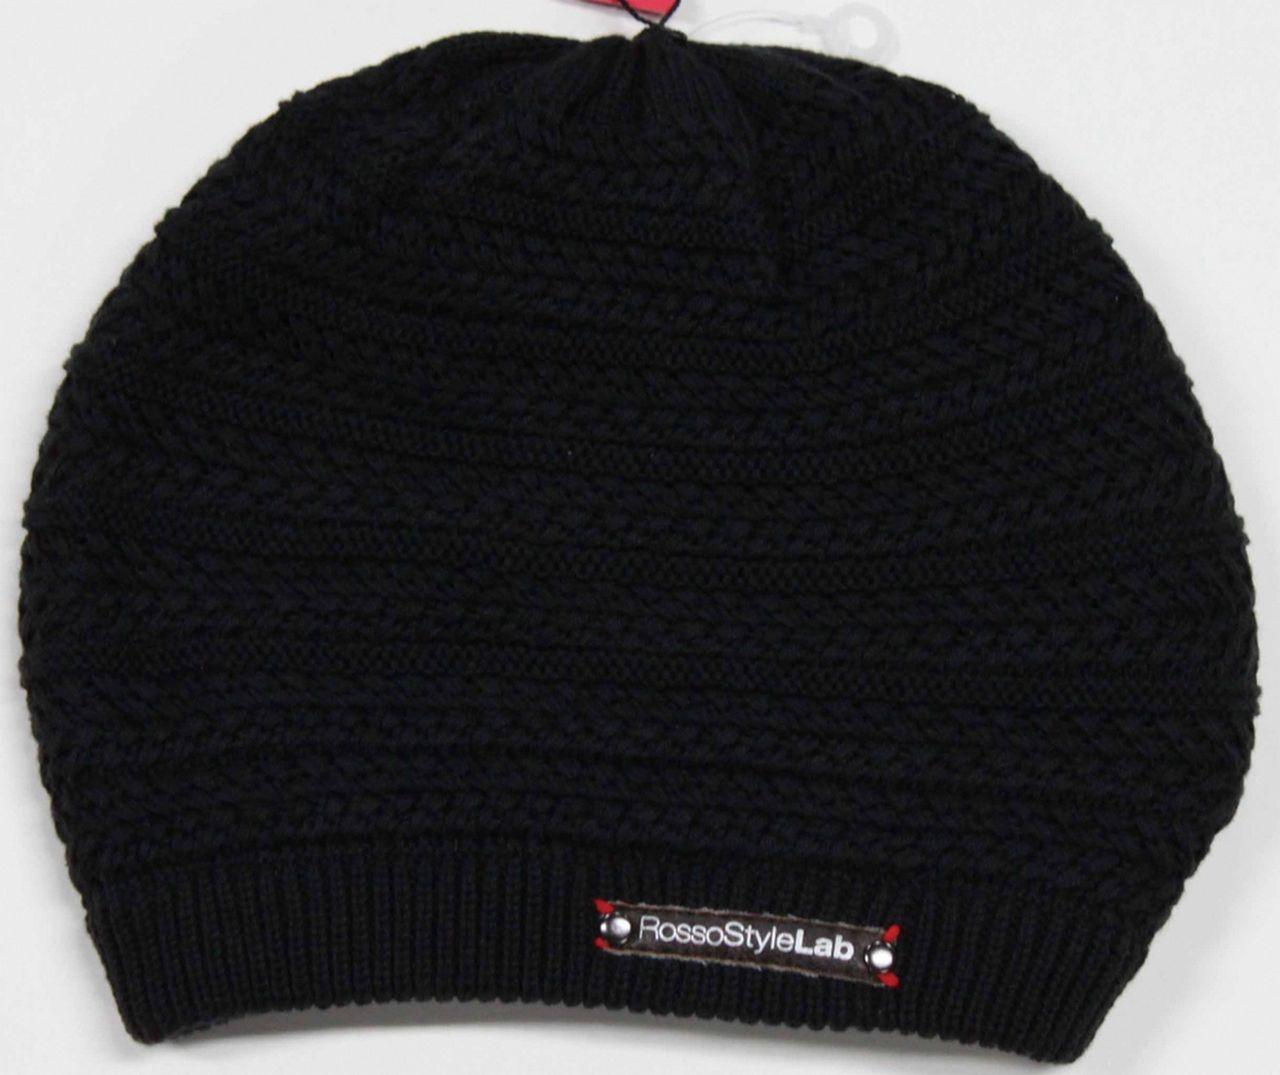 【Rosso StyleLab】Rosso棉質貝雷帽 - 「Webike-摩托百貨」